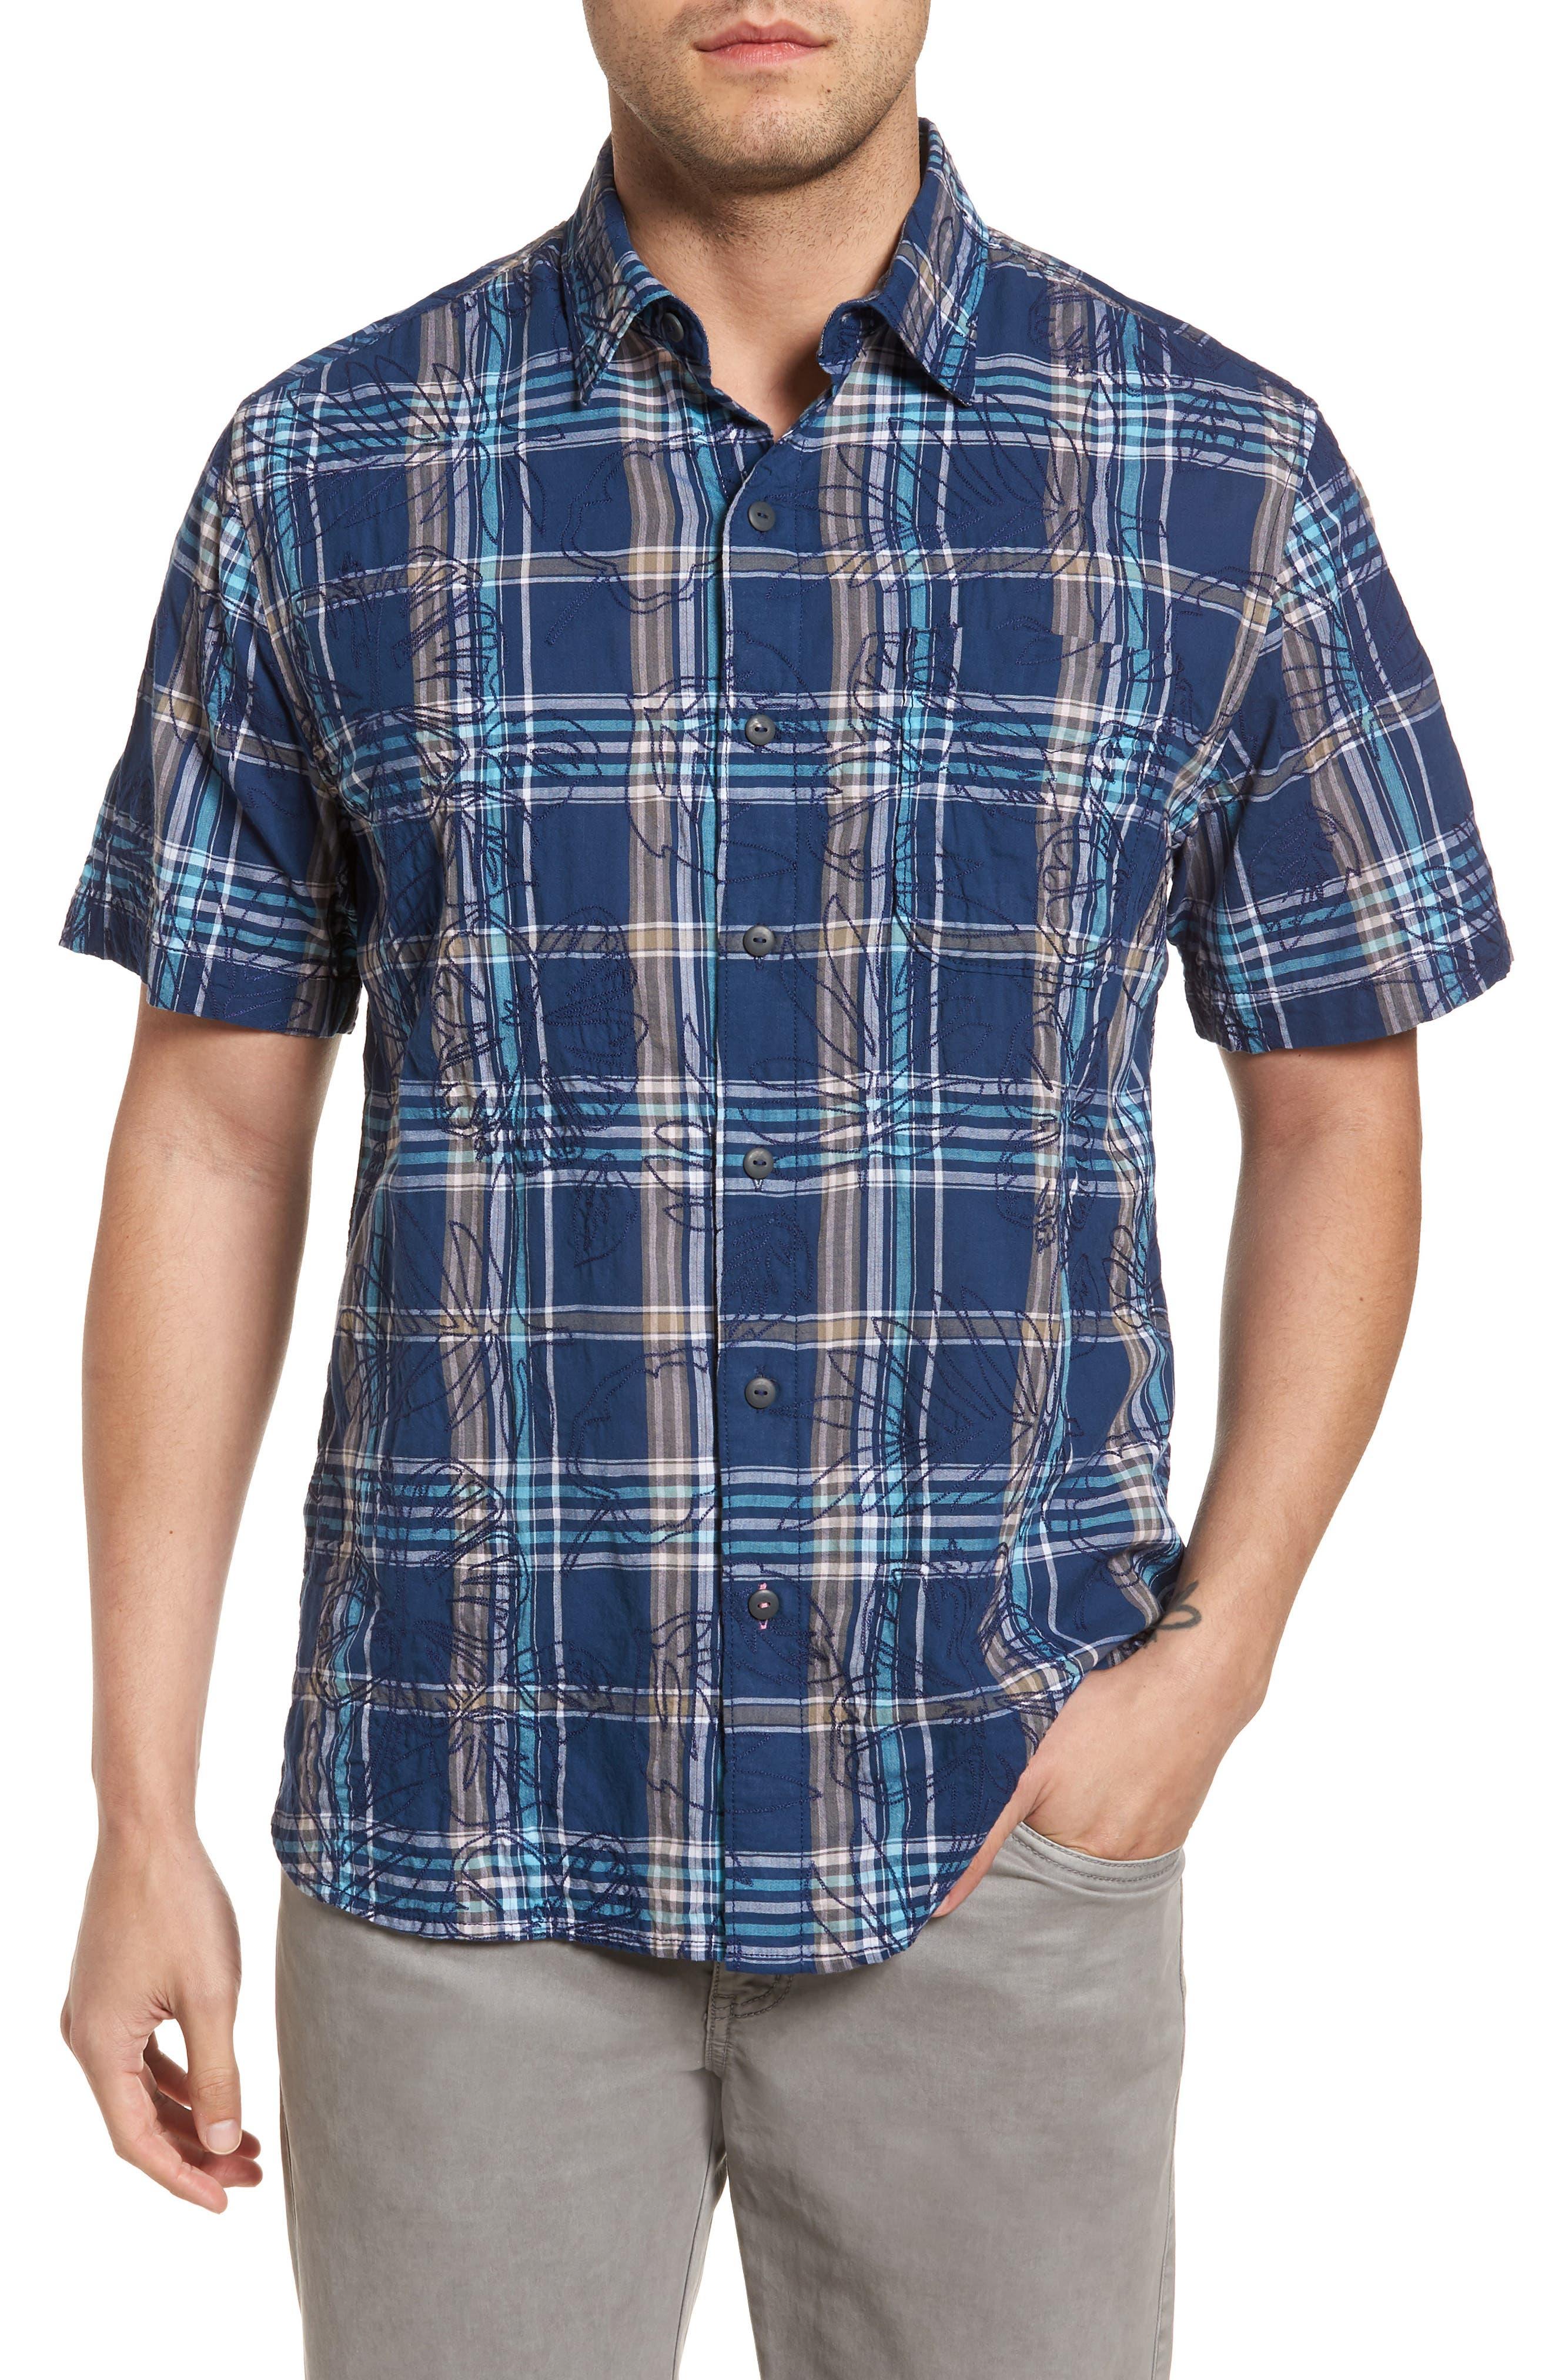 Alternate Image 1 Selected - Tommy Bahama Palazzo Regular Fit Plaid Sport Shirt